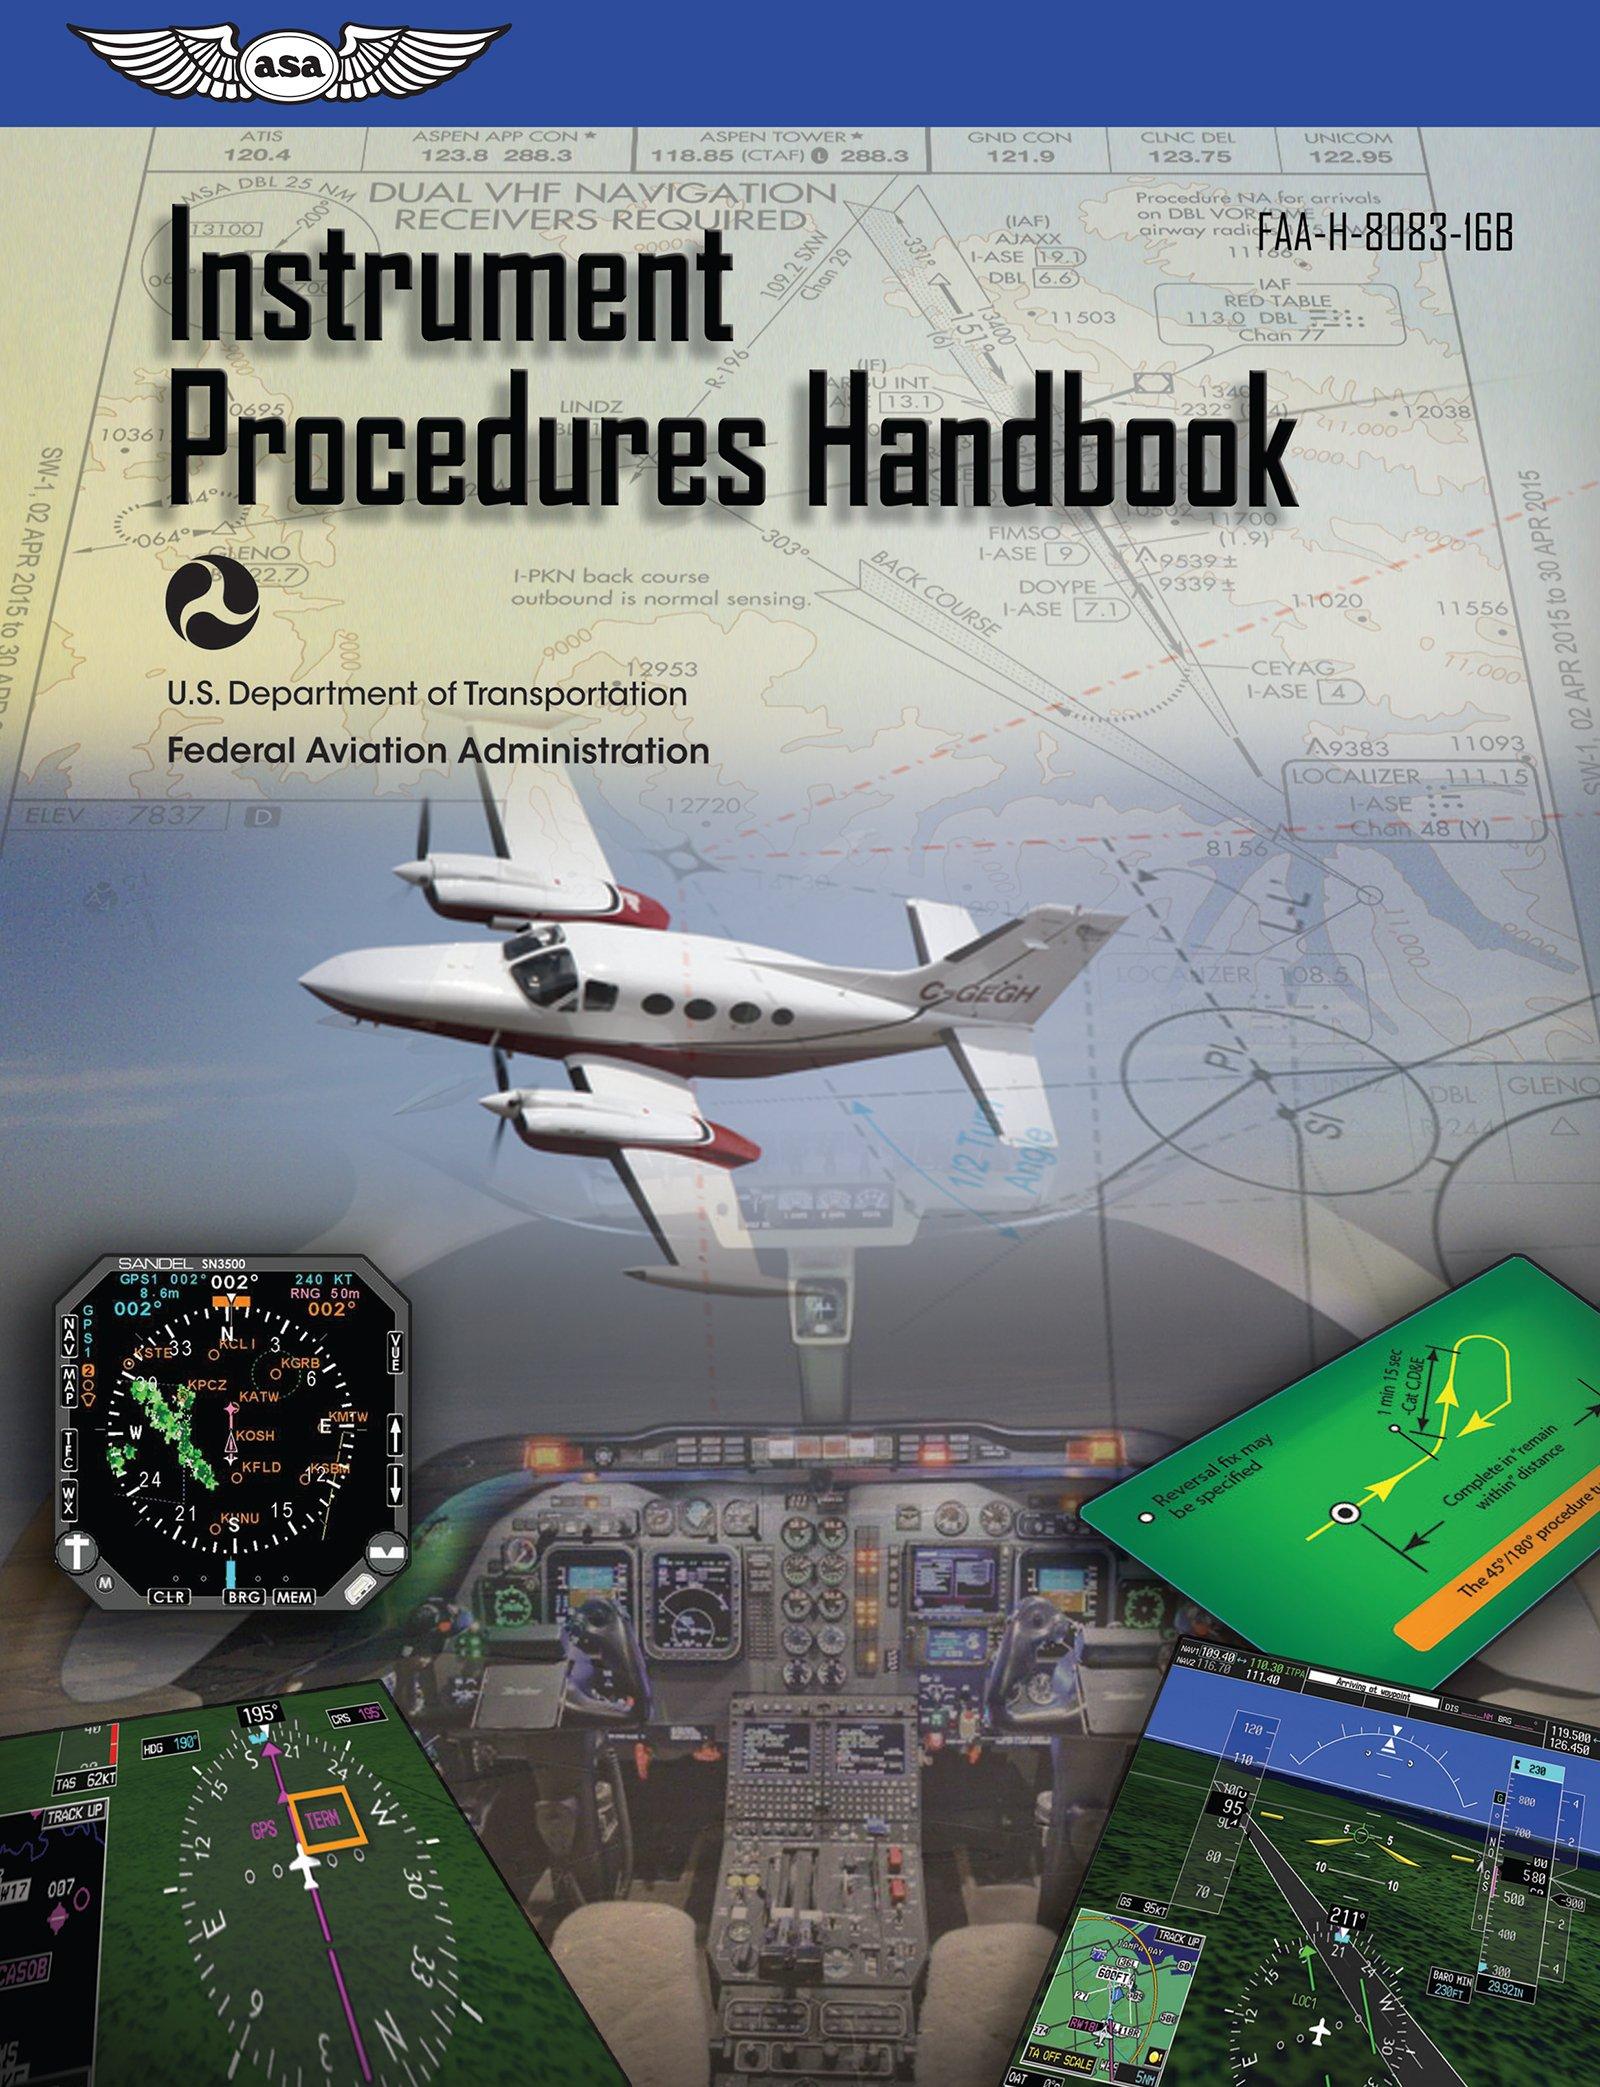 Instrument Procedures Handbook: FAA-H-8083-16B (FAA Handbooks series) by Brand: Aviation Supplies and Academics, Inc.